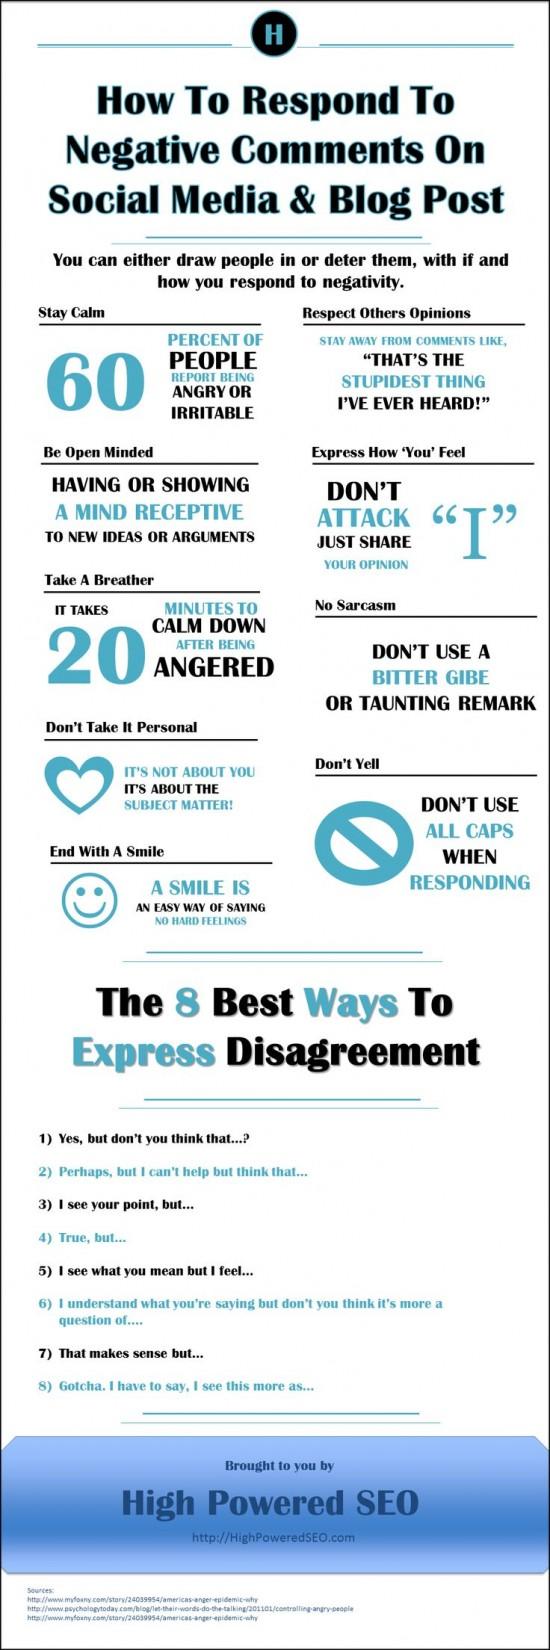 Jak odpovidat na negativni komentare - infografika